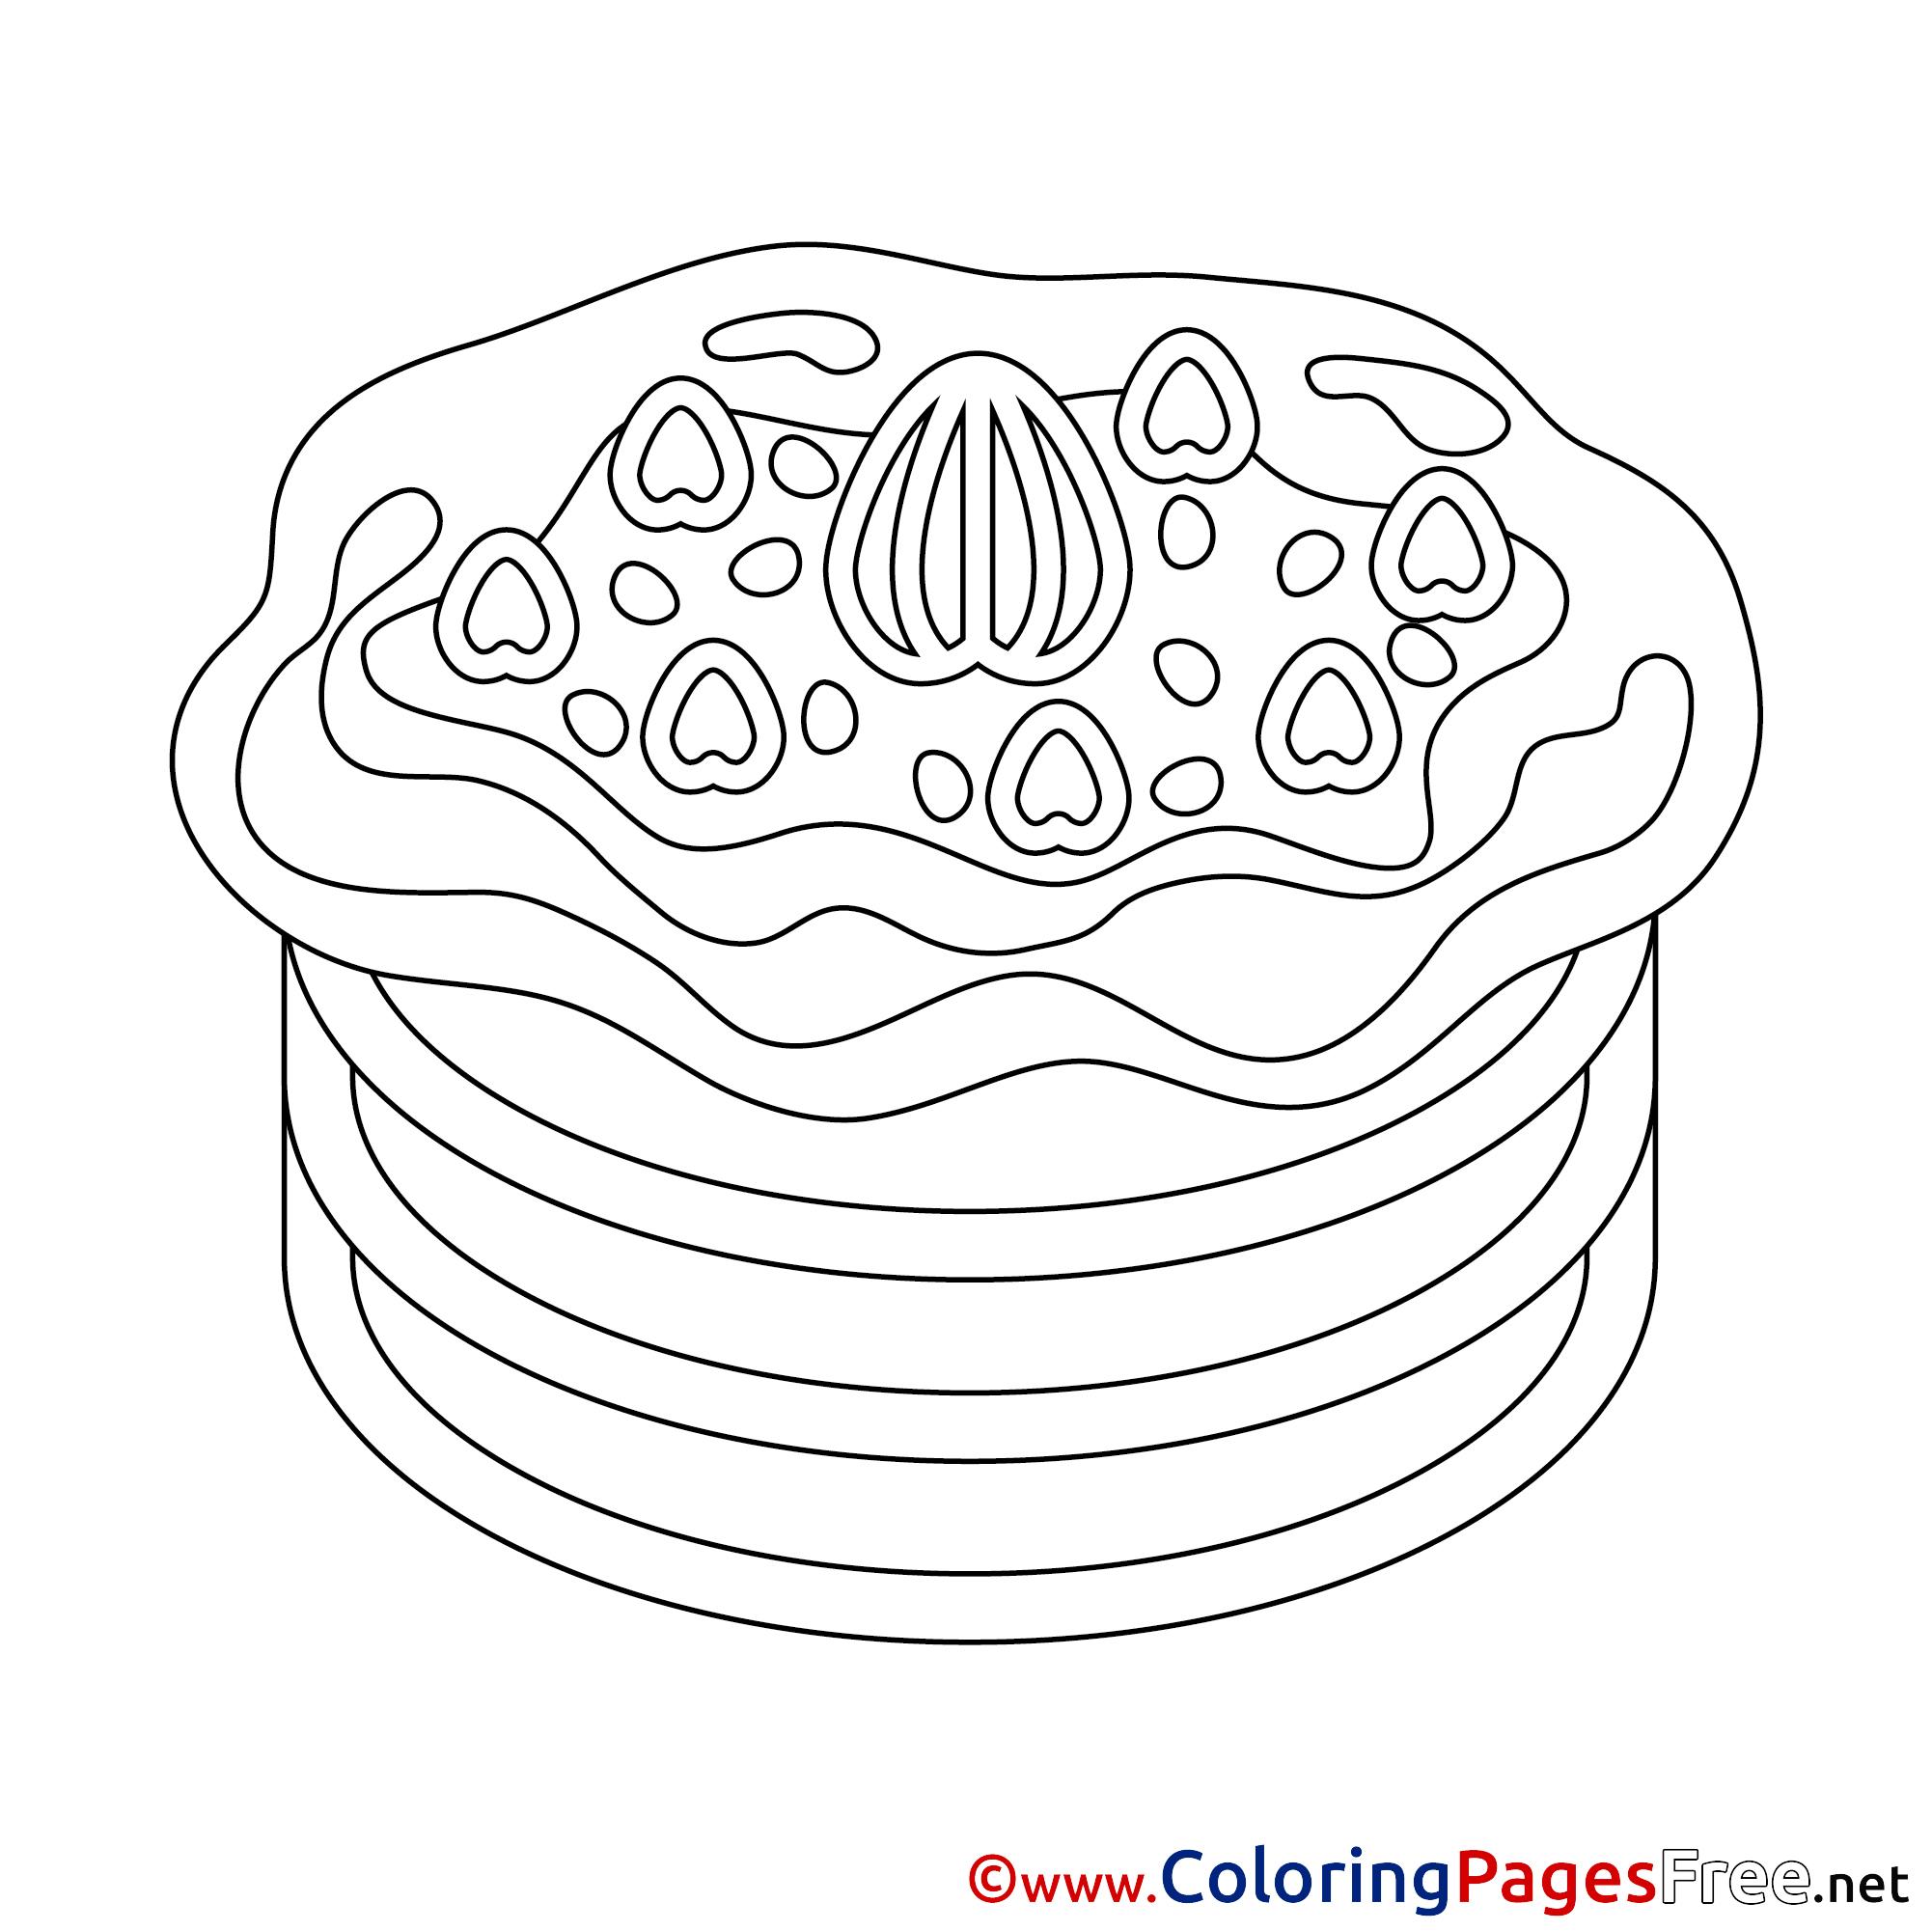 Ultra Rare Strawberry Pancake Shopkin coloring page | Free ... | 2001x2002